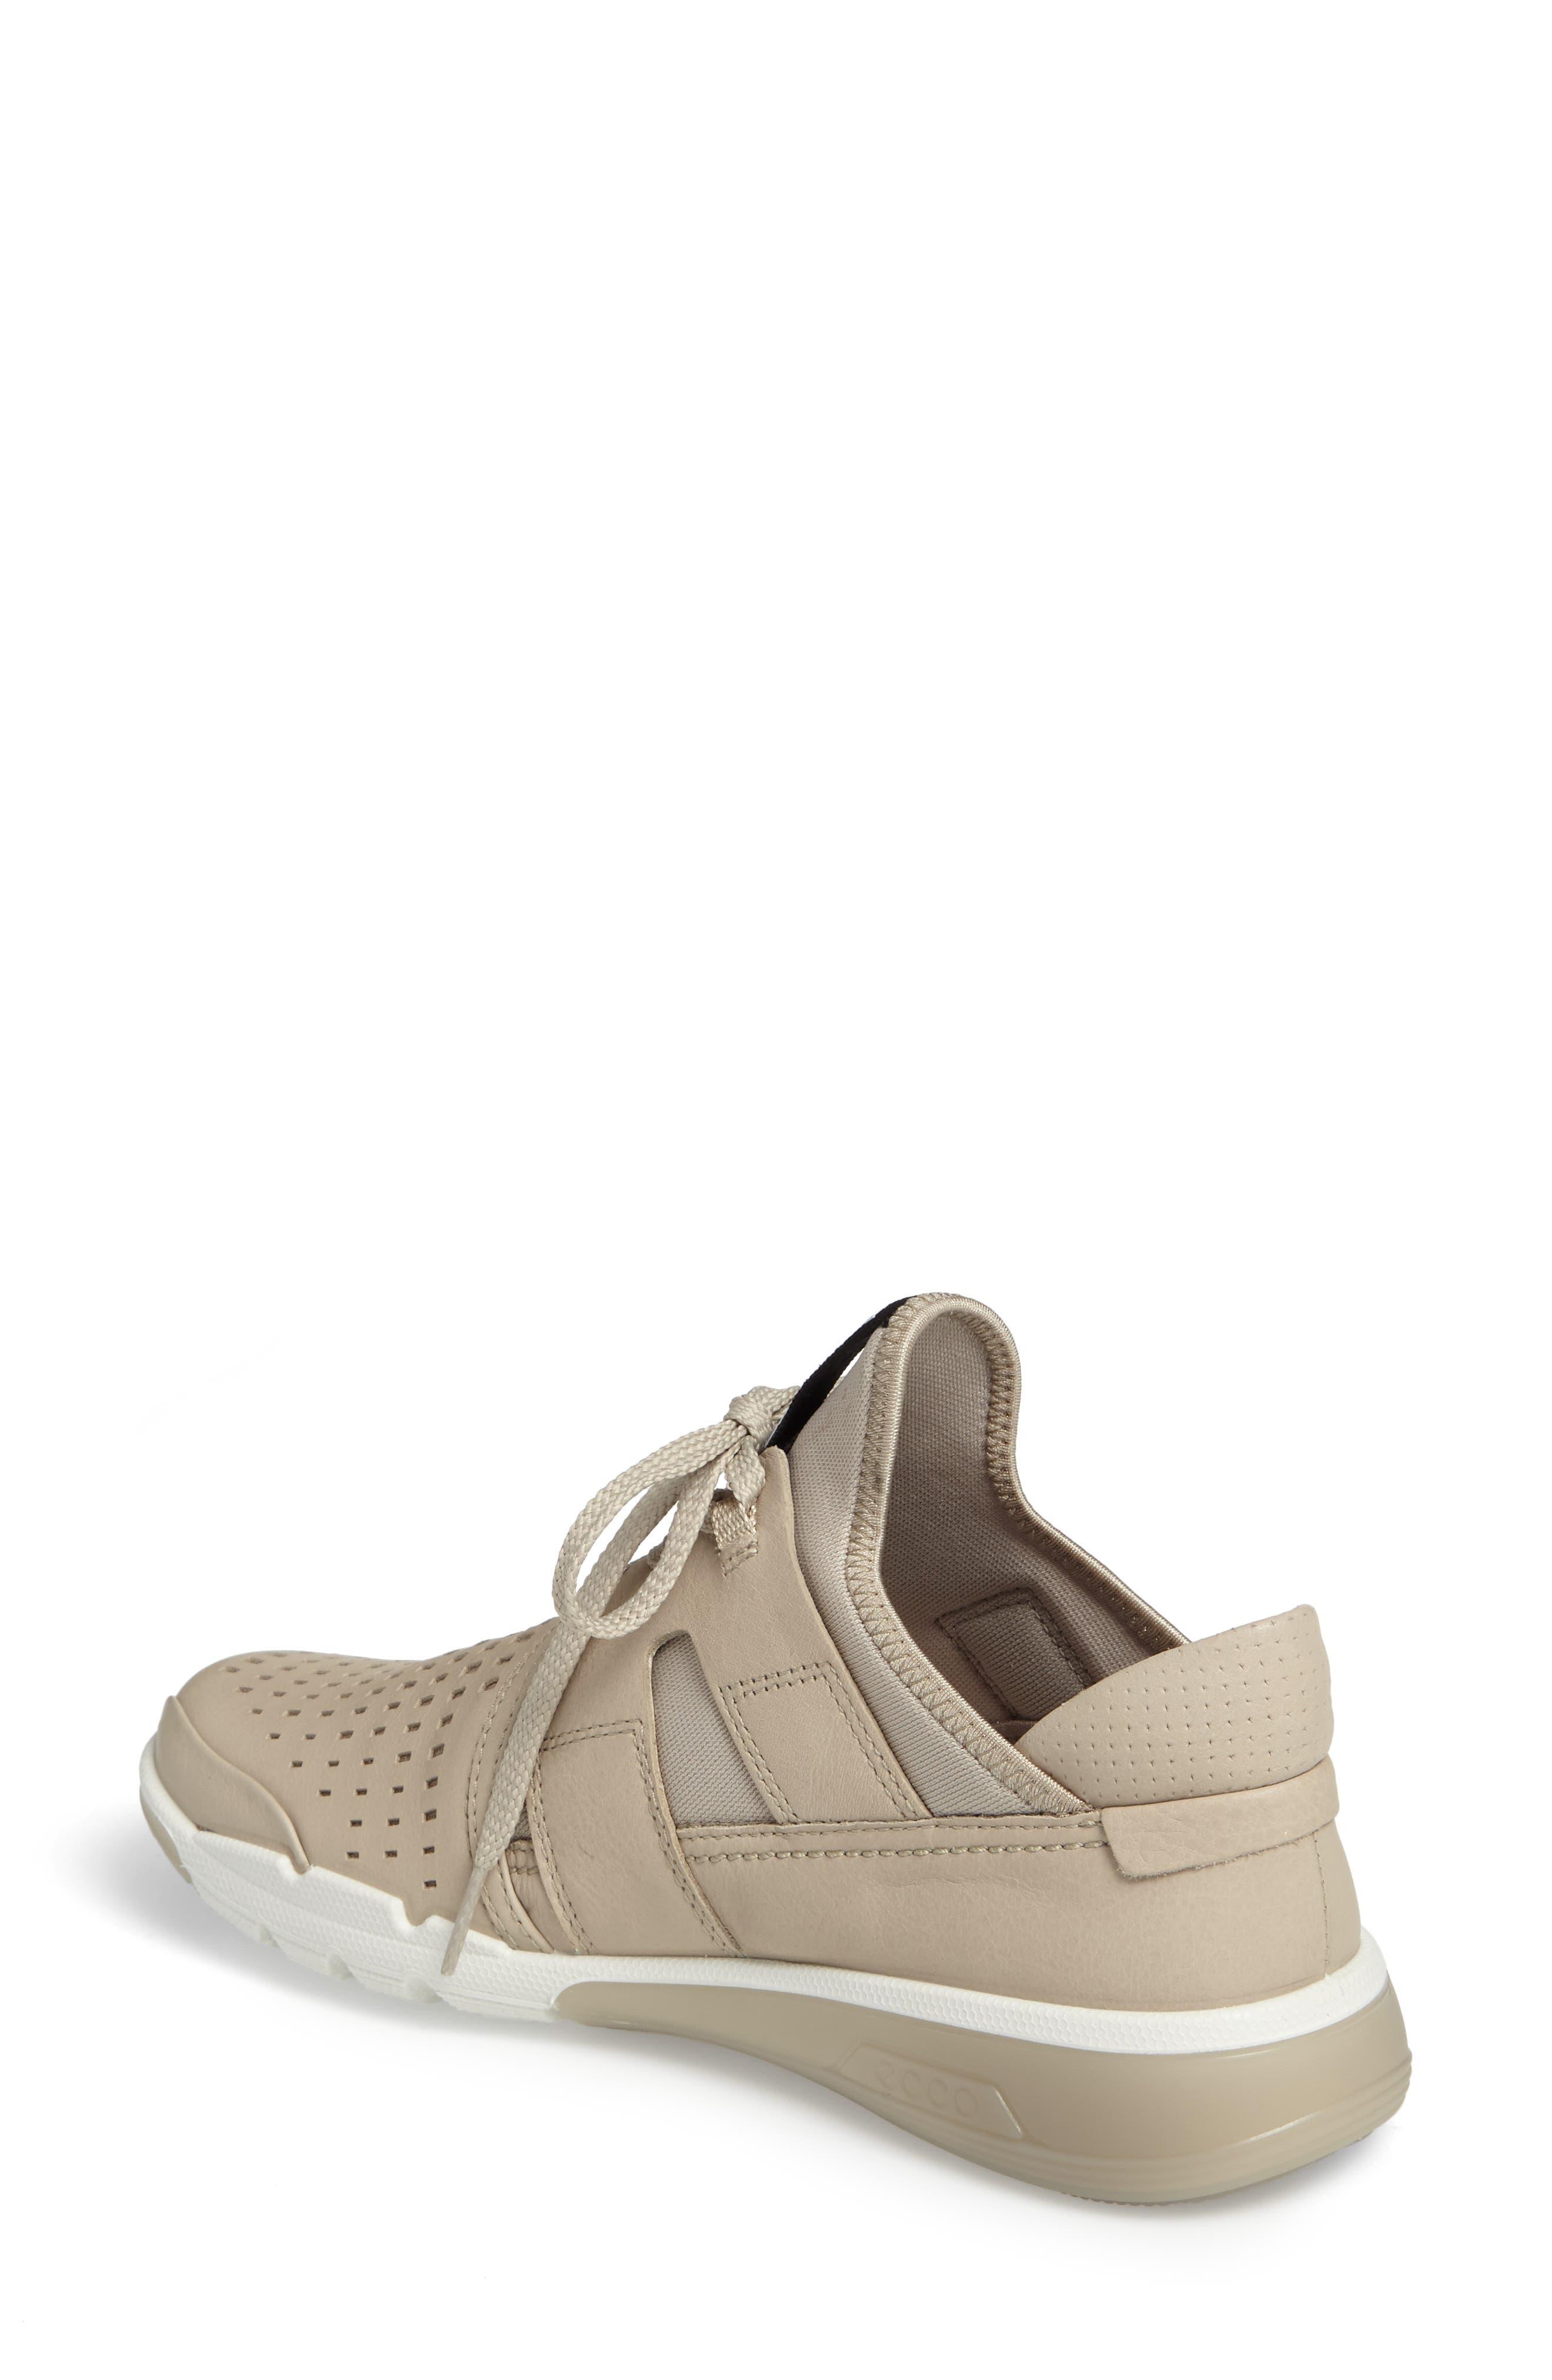 Intrinsic 2 Sneaker,                             Alternate thumbnail 4, color,